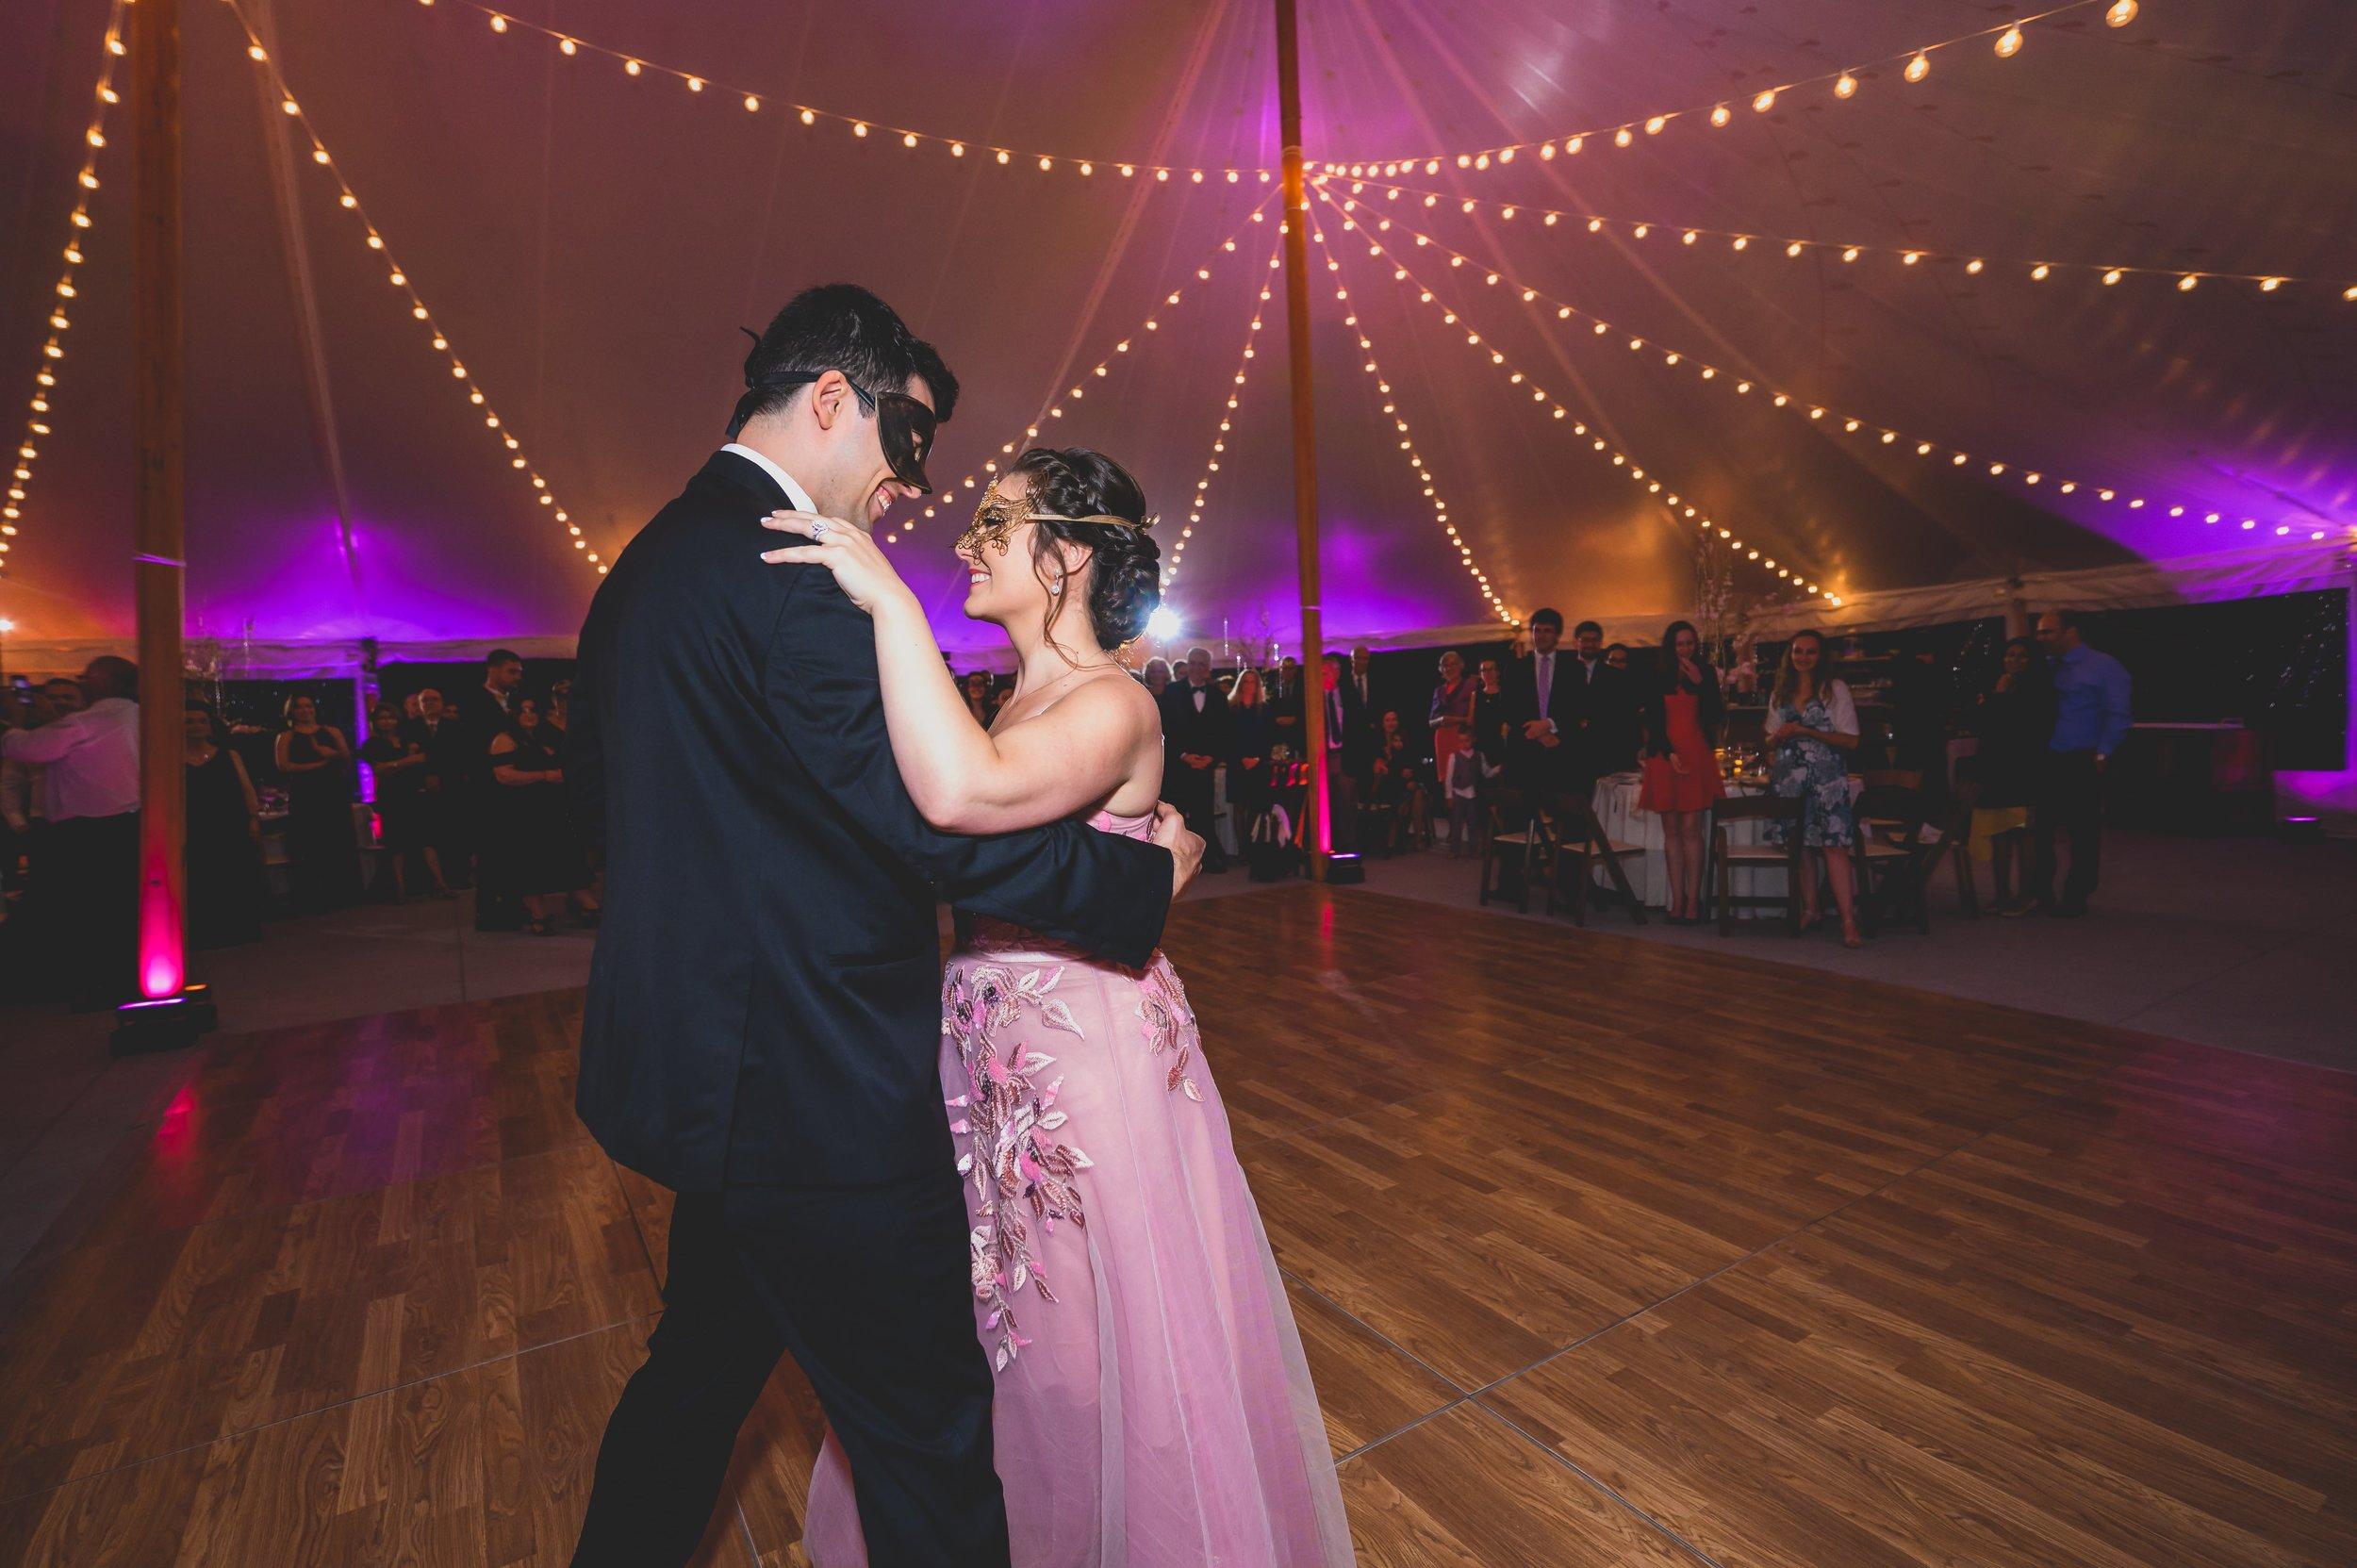 masquerade-wedding-theme-first-dance